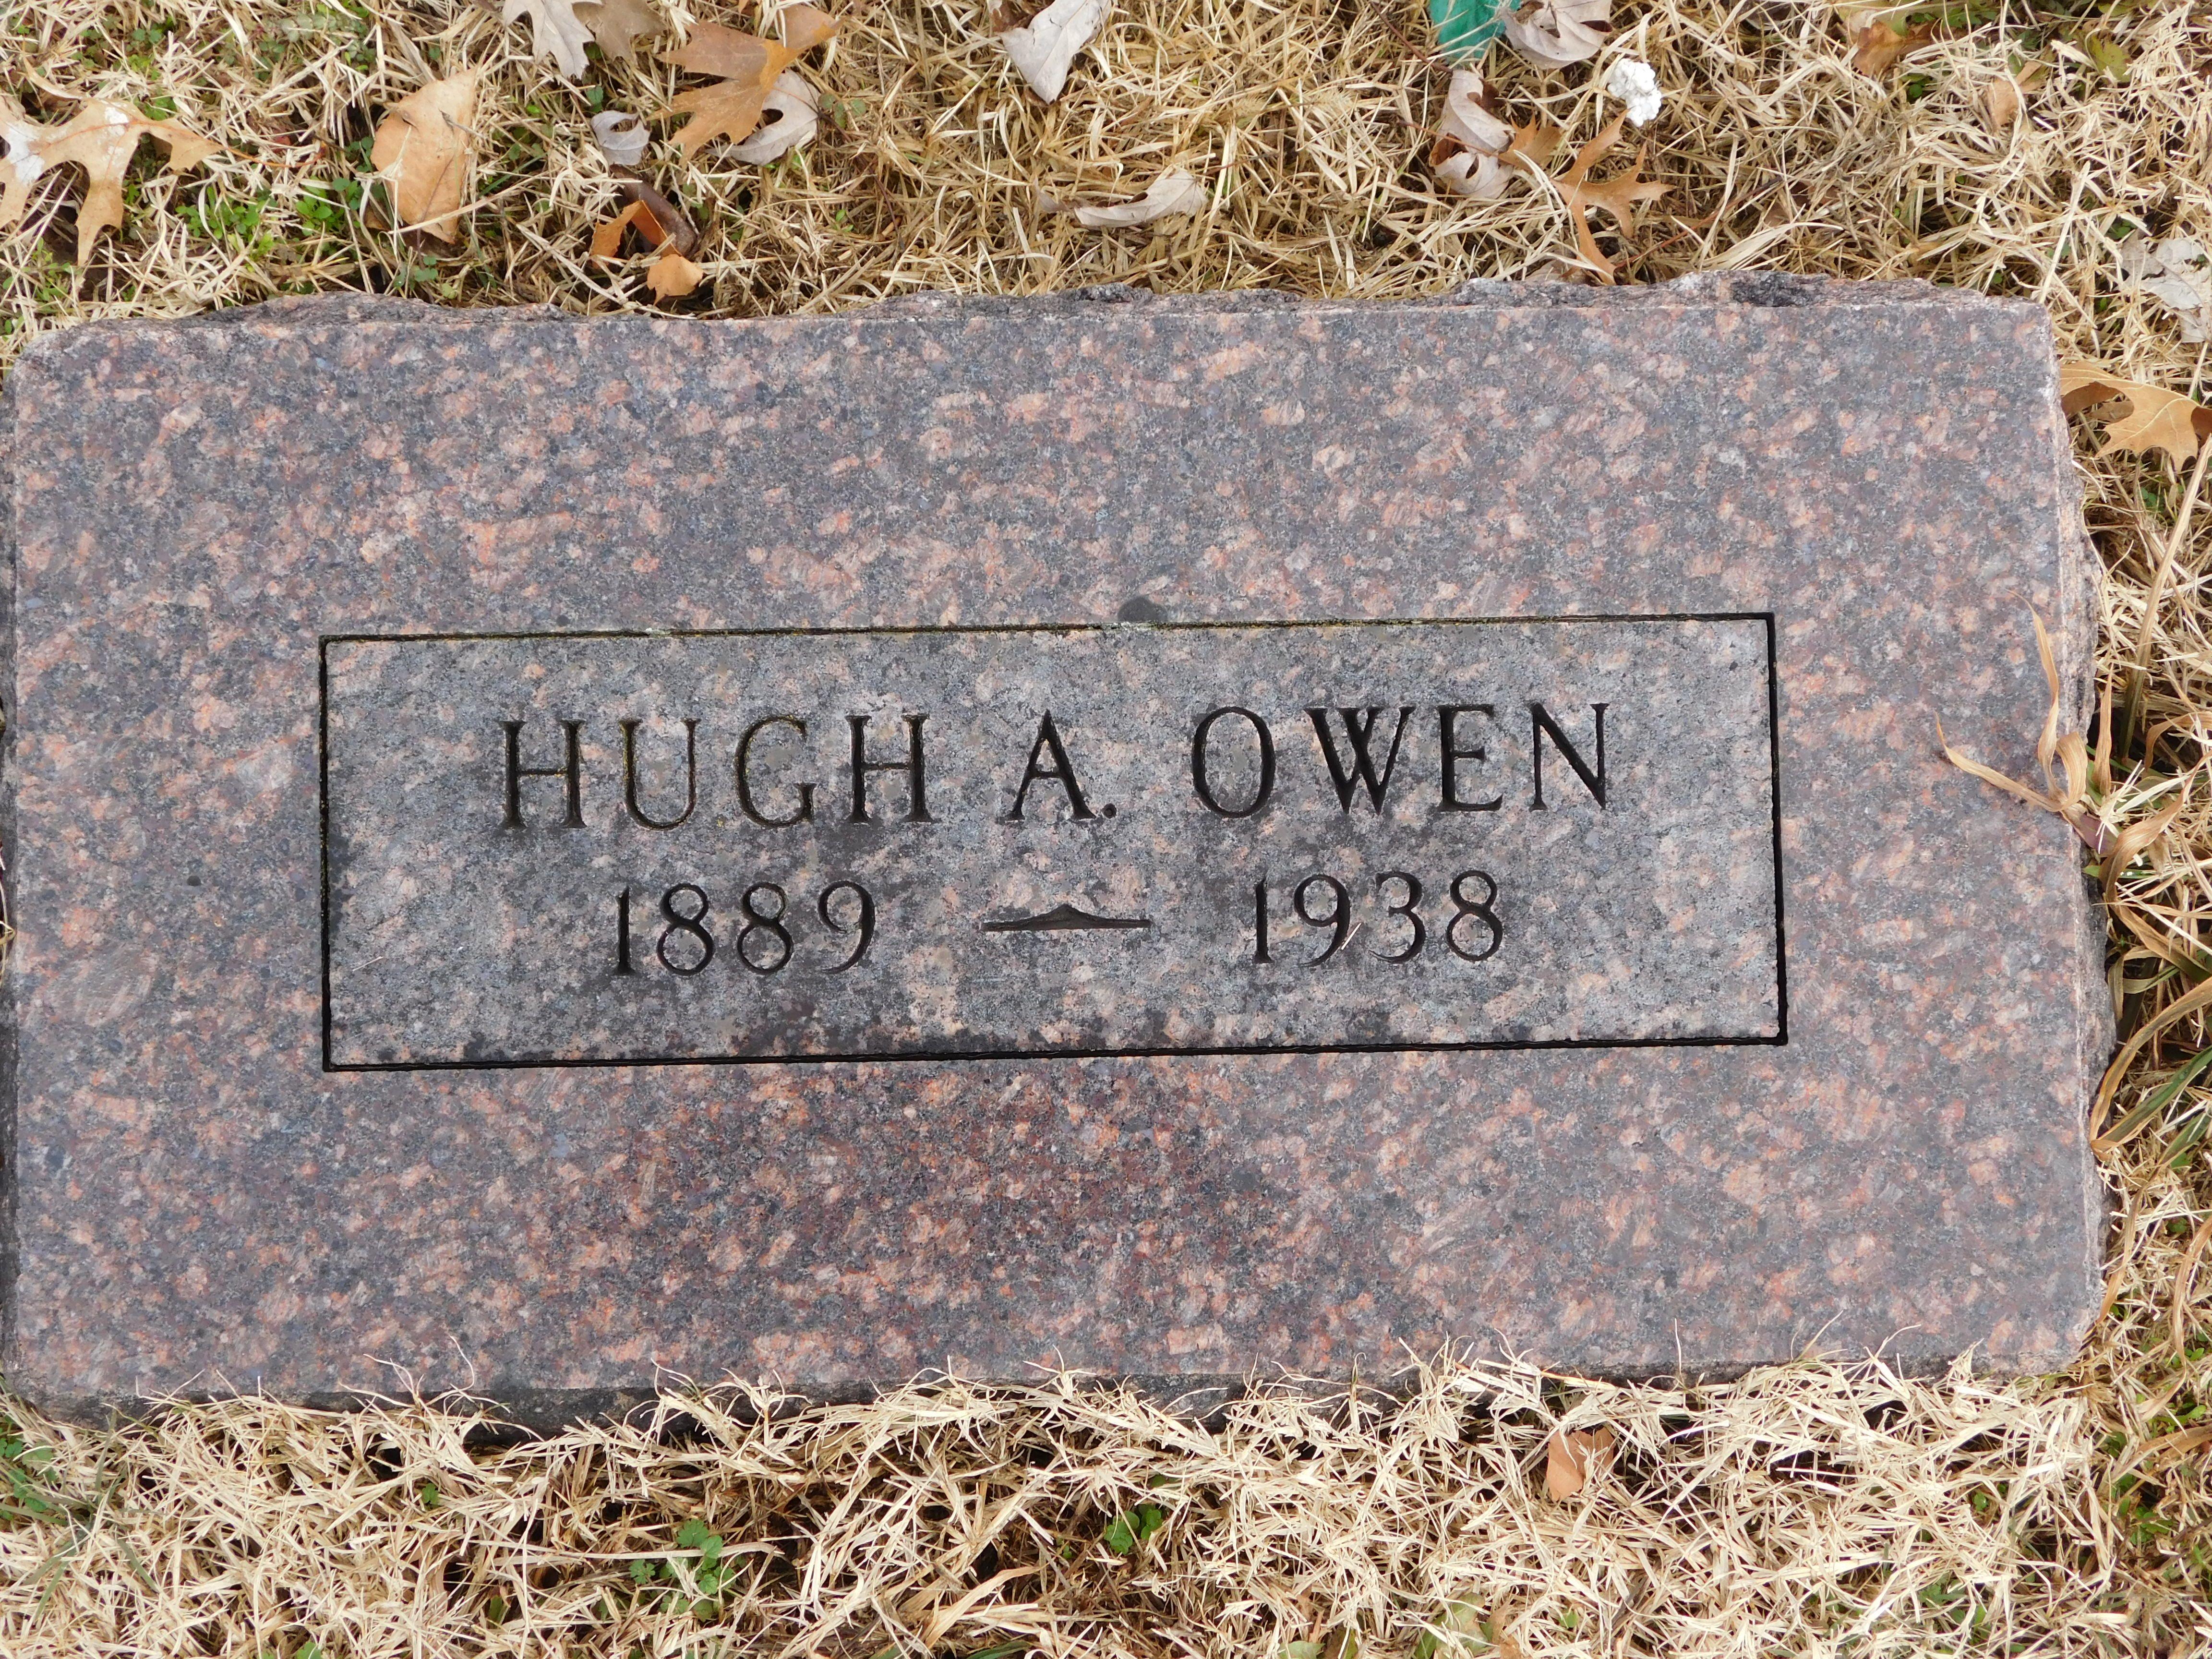 Sheriff Hugh Owen   Nowata County Sheriff's Office, Oklahoma